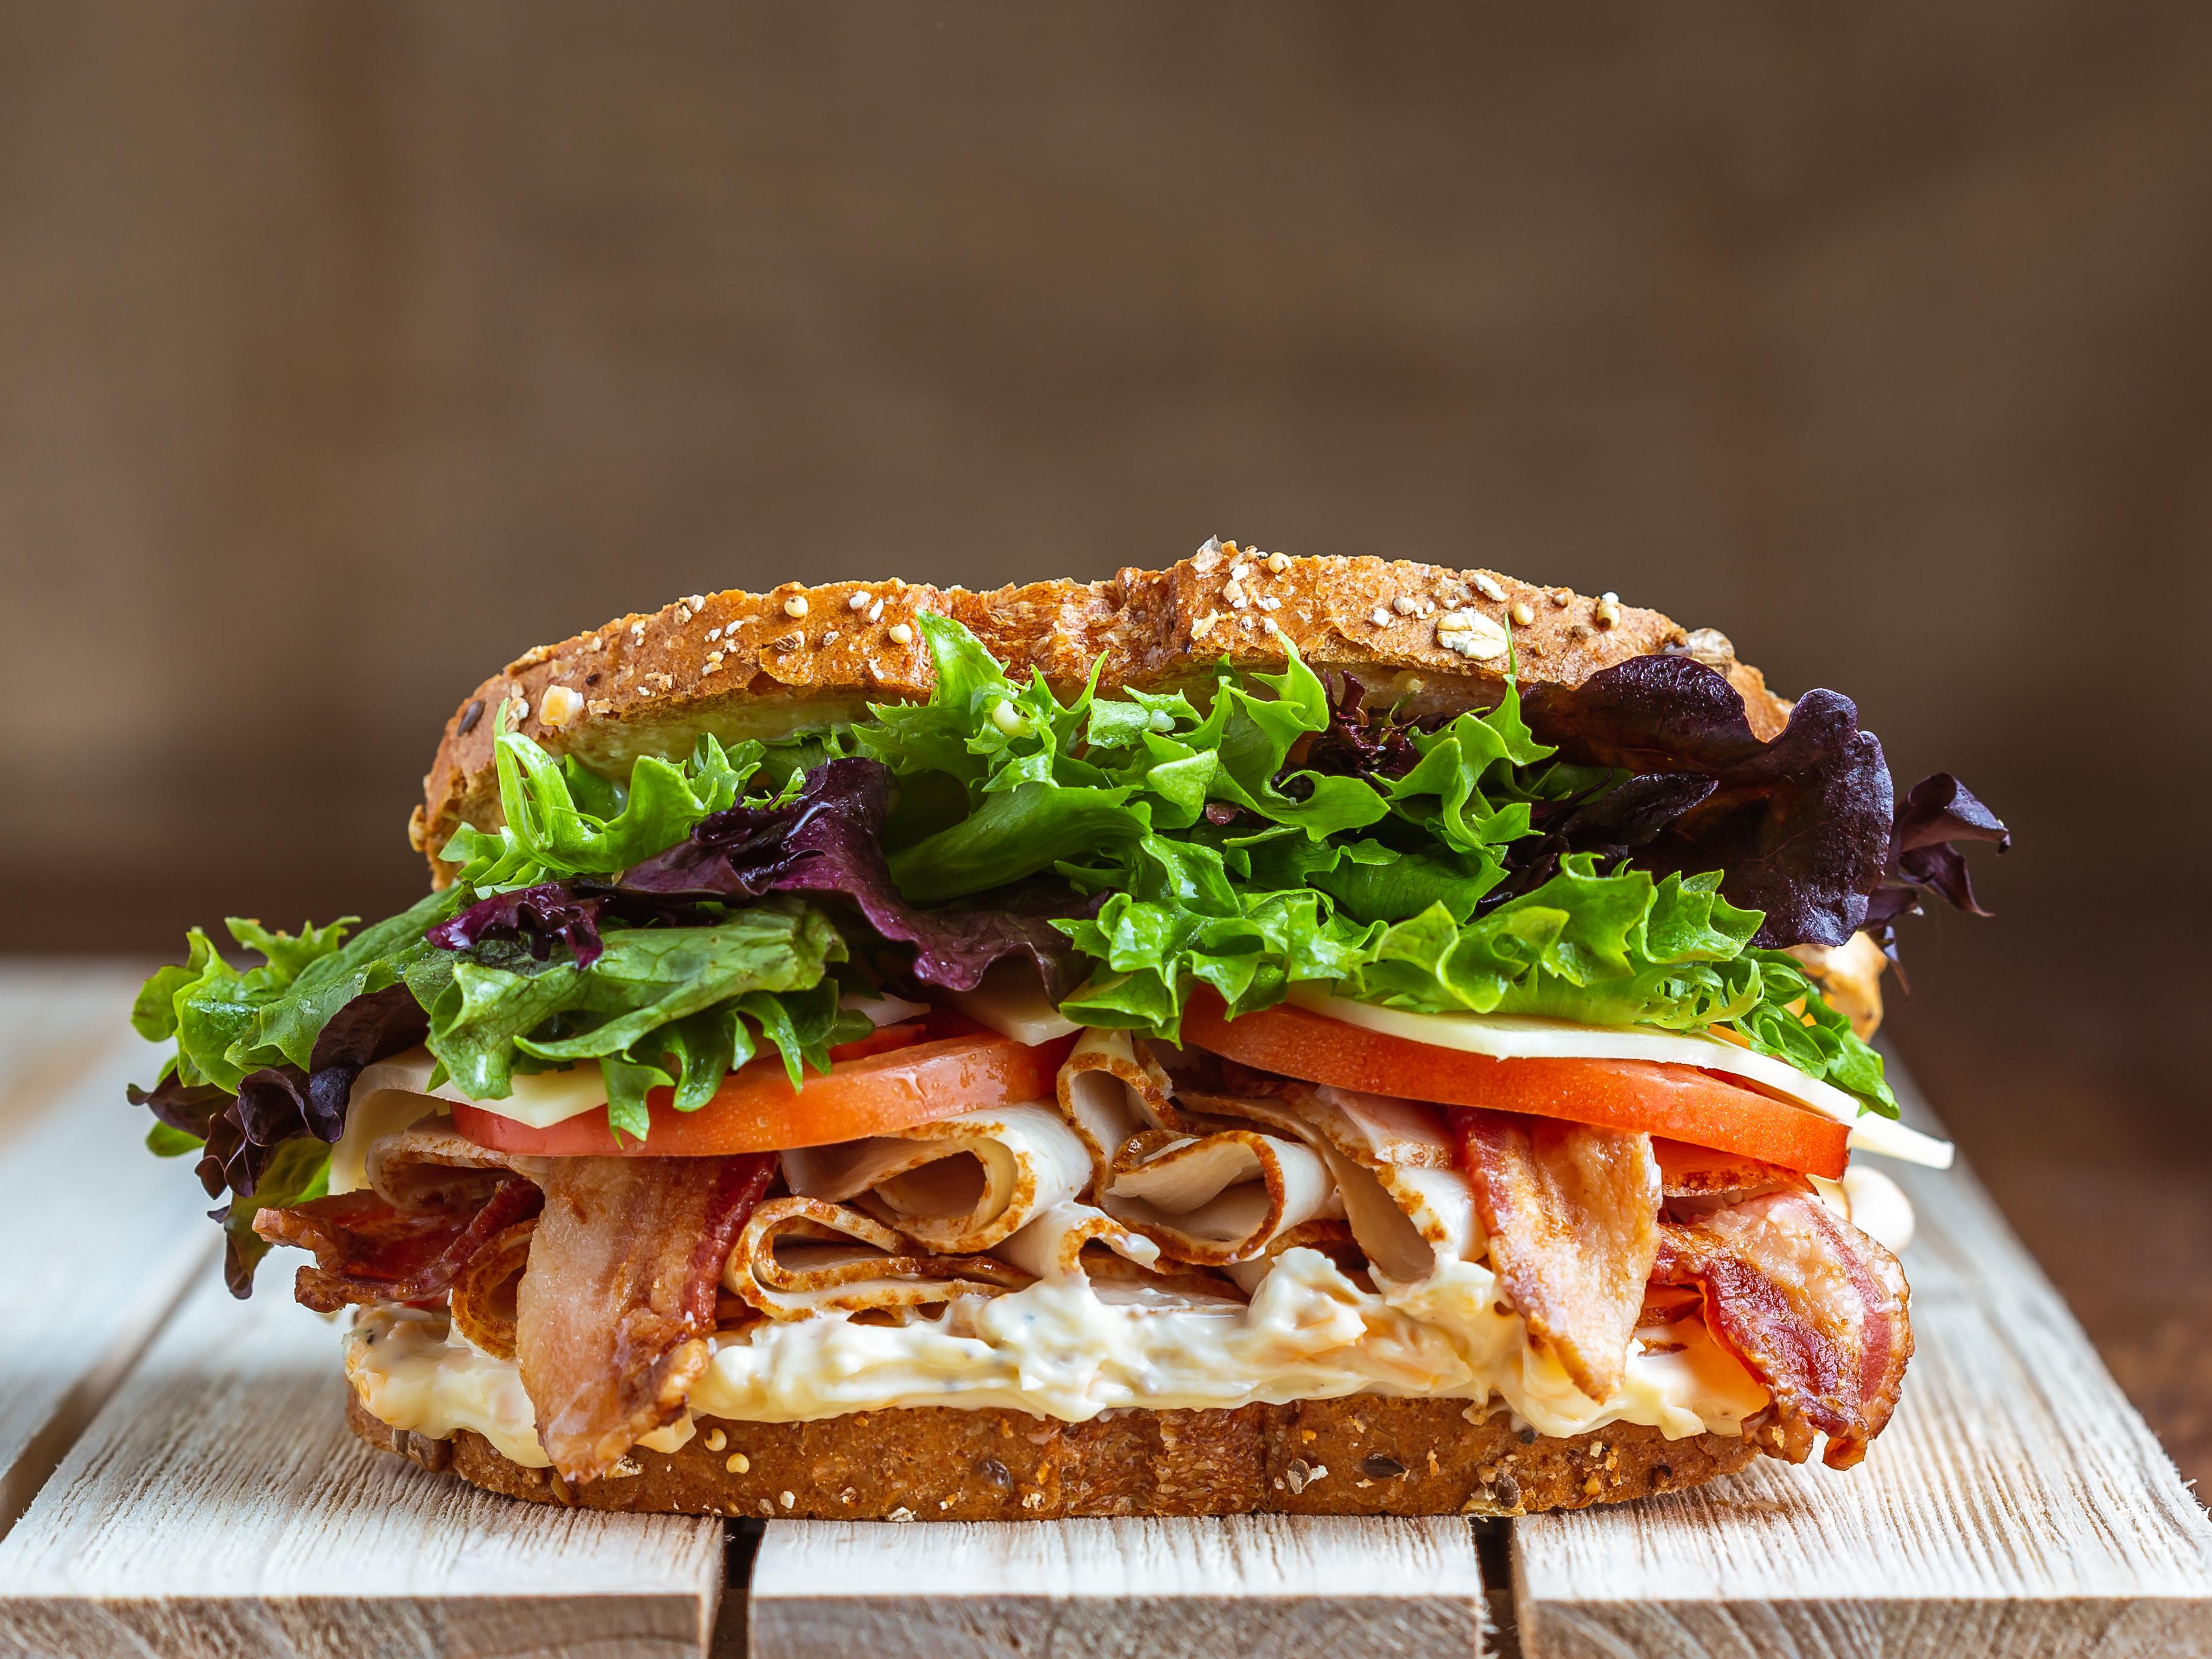 Sams Mart Convenience Store sandwich line shoot